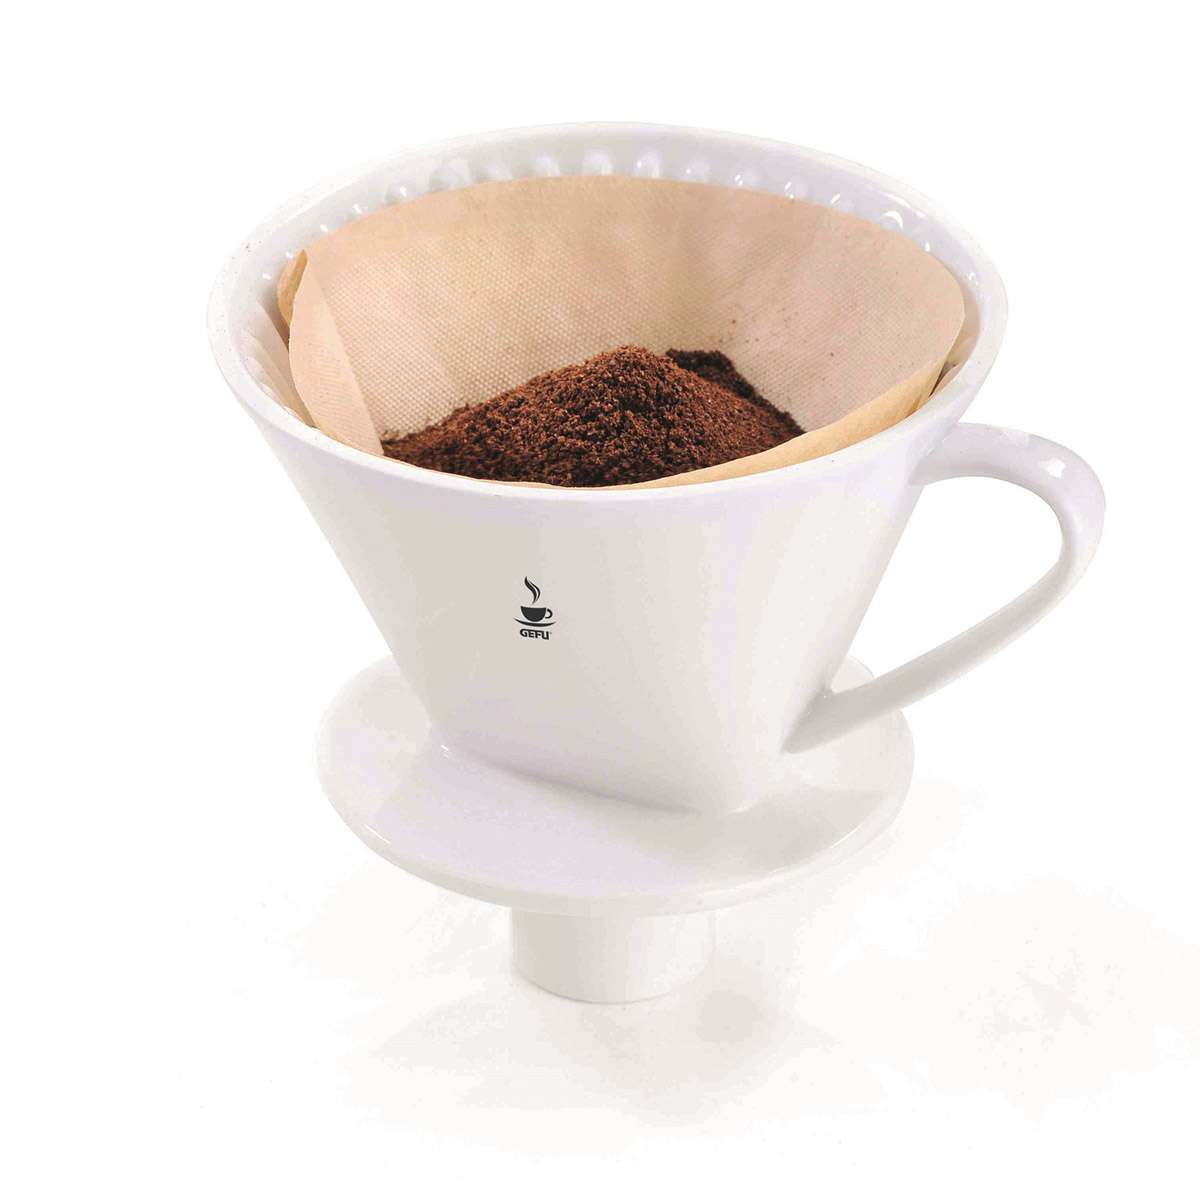 GEFU - 'Kaffeefilter SANDRO, Gr. 4 - Kaffee | Tee'